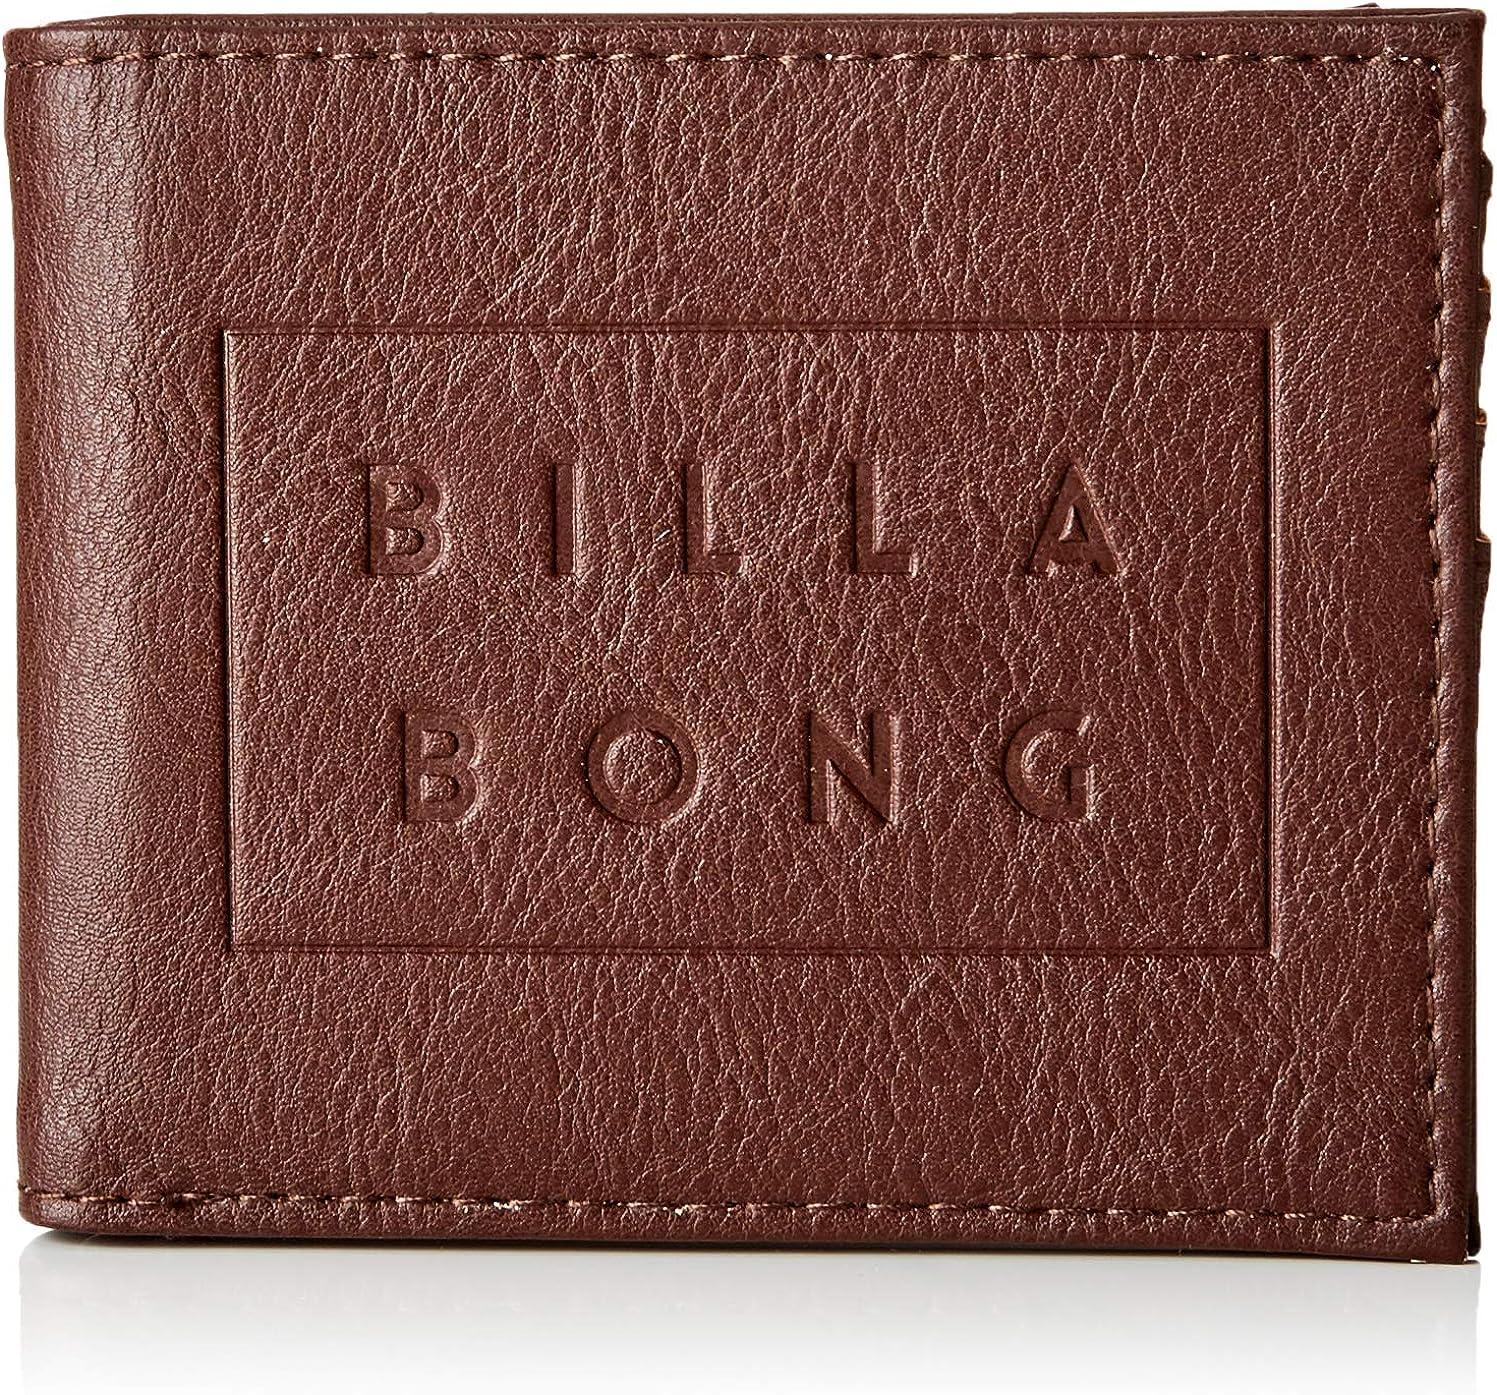 BILLABONG™ Die Cut Wallet H5WM02BIP8